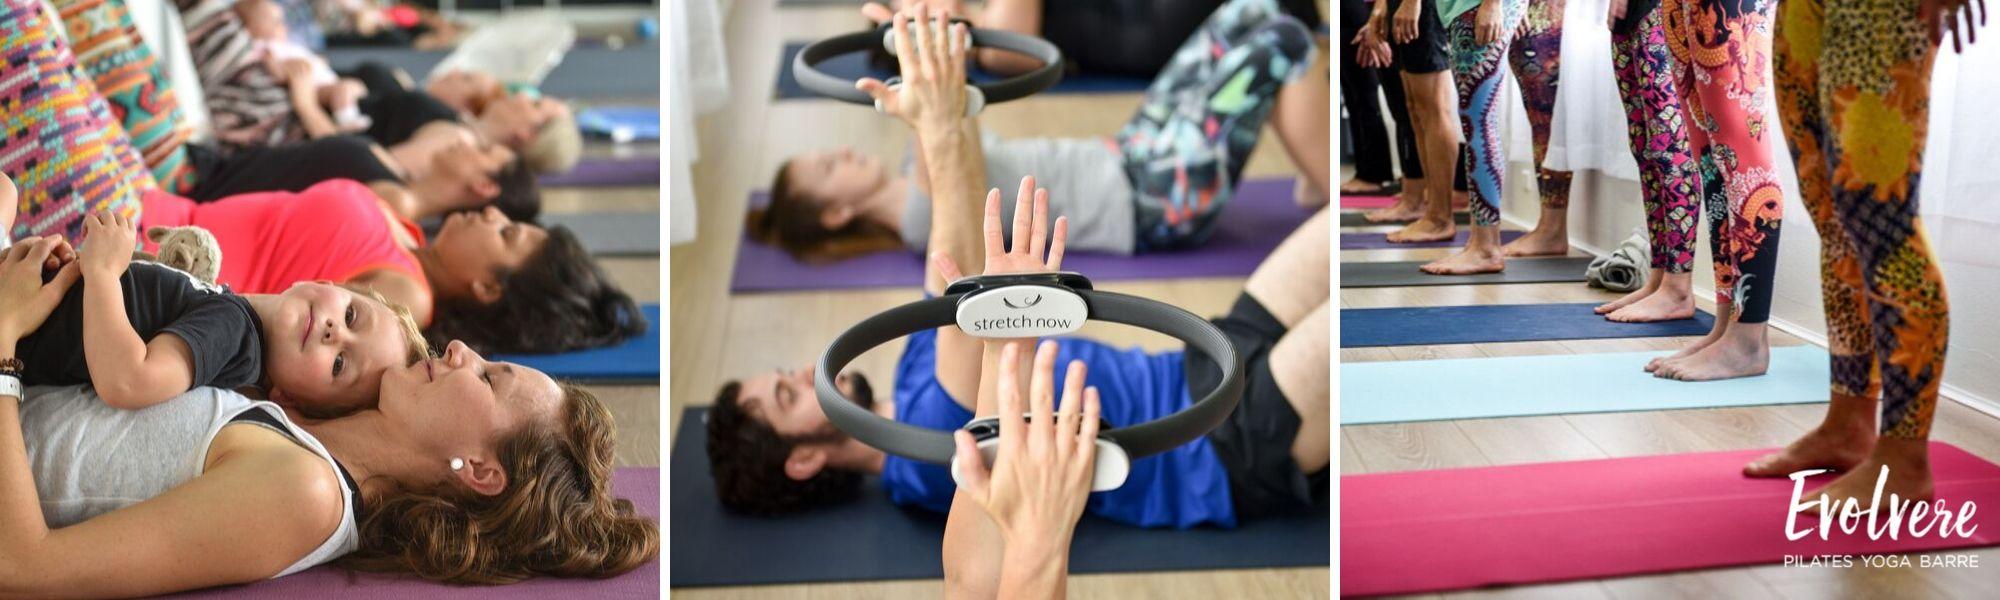 Timetable of Barre classes in Lane Cove at Evolvere Pilates Yoga Barre studio